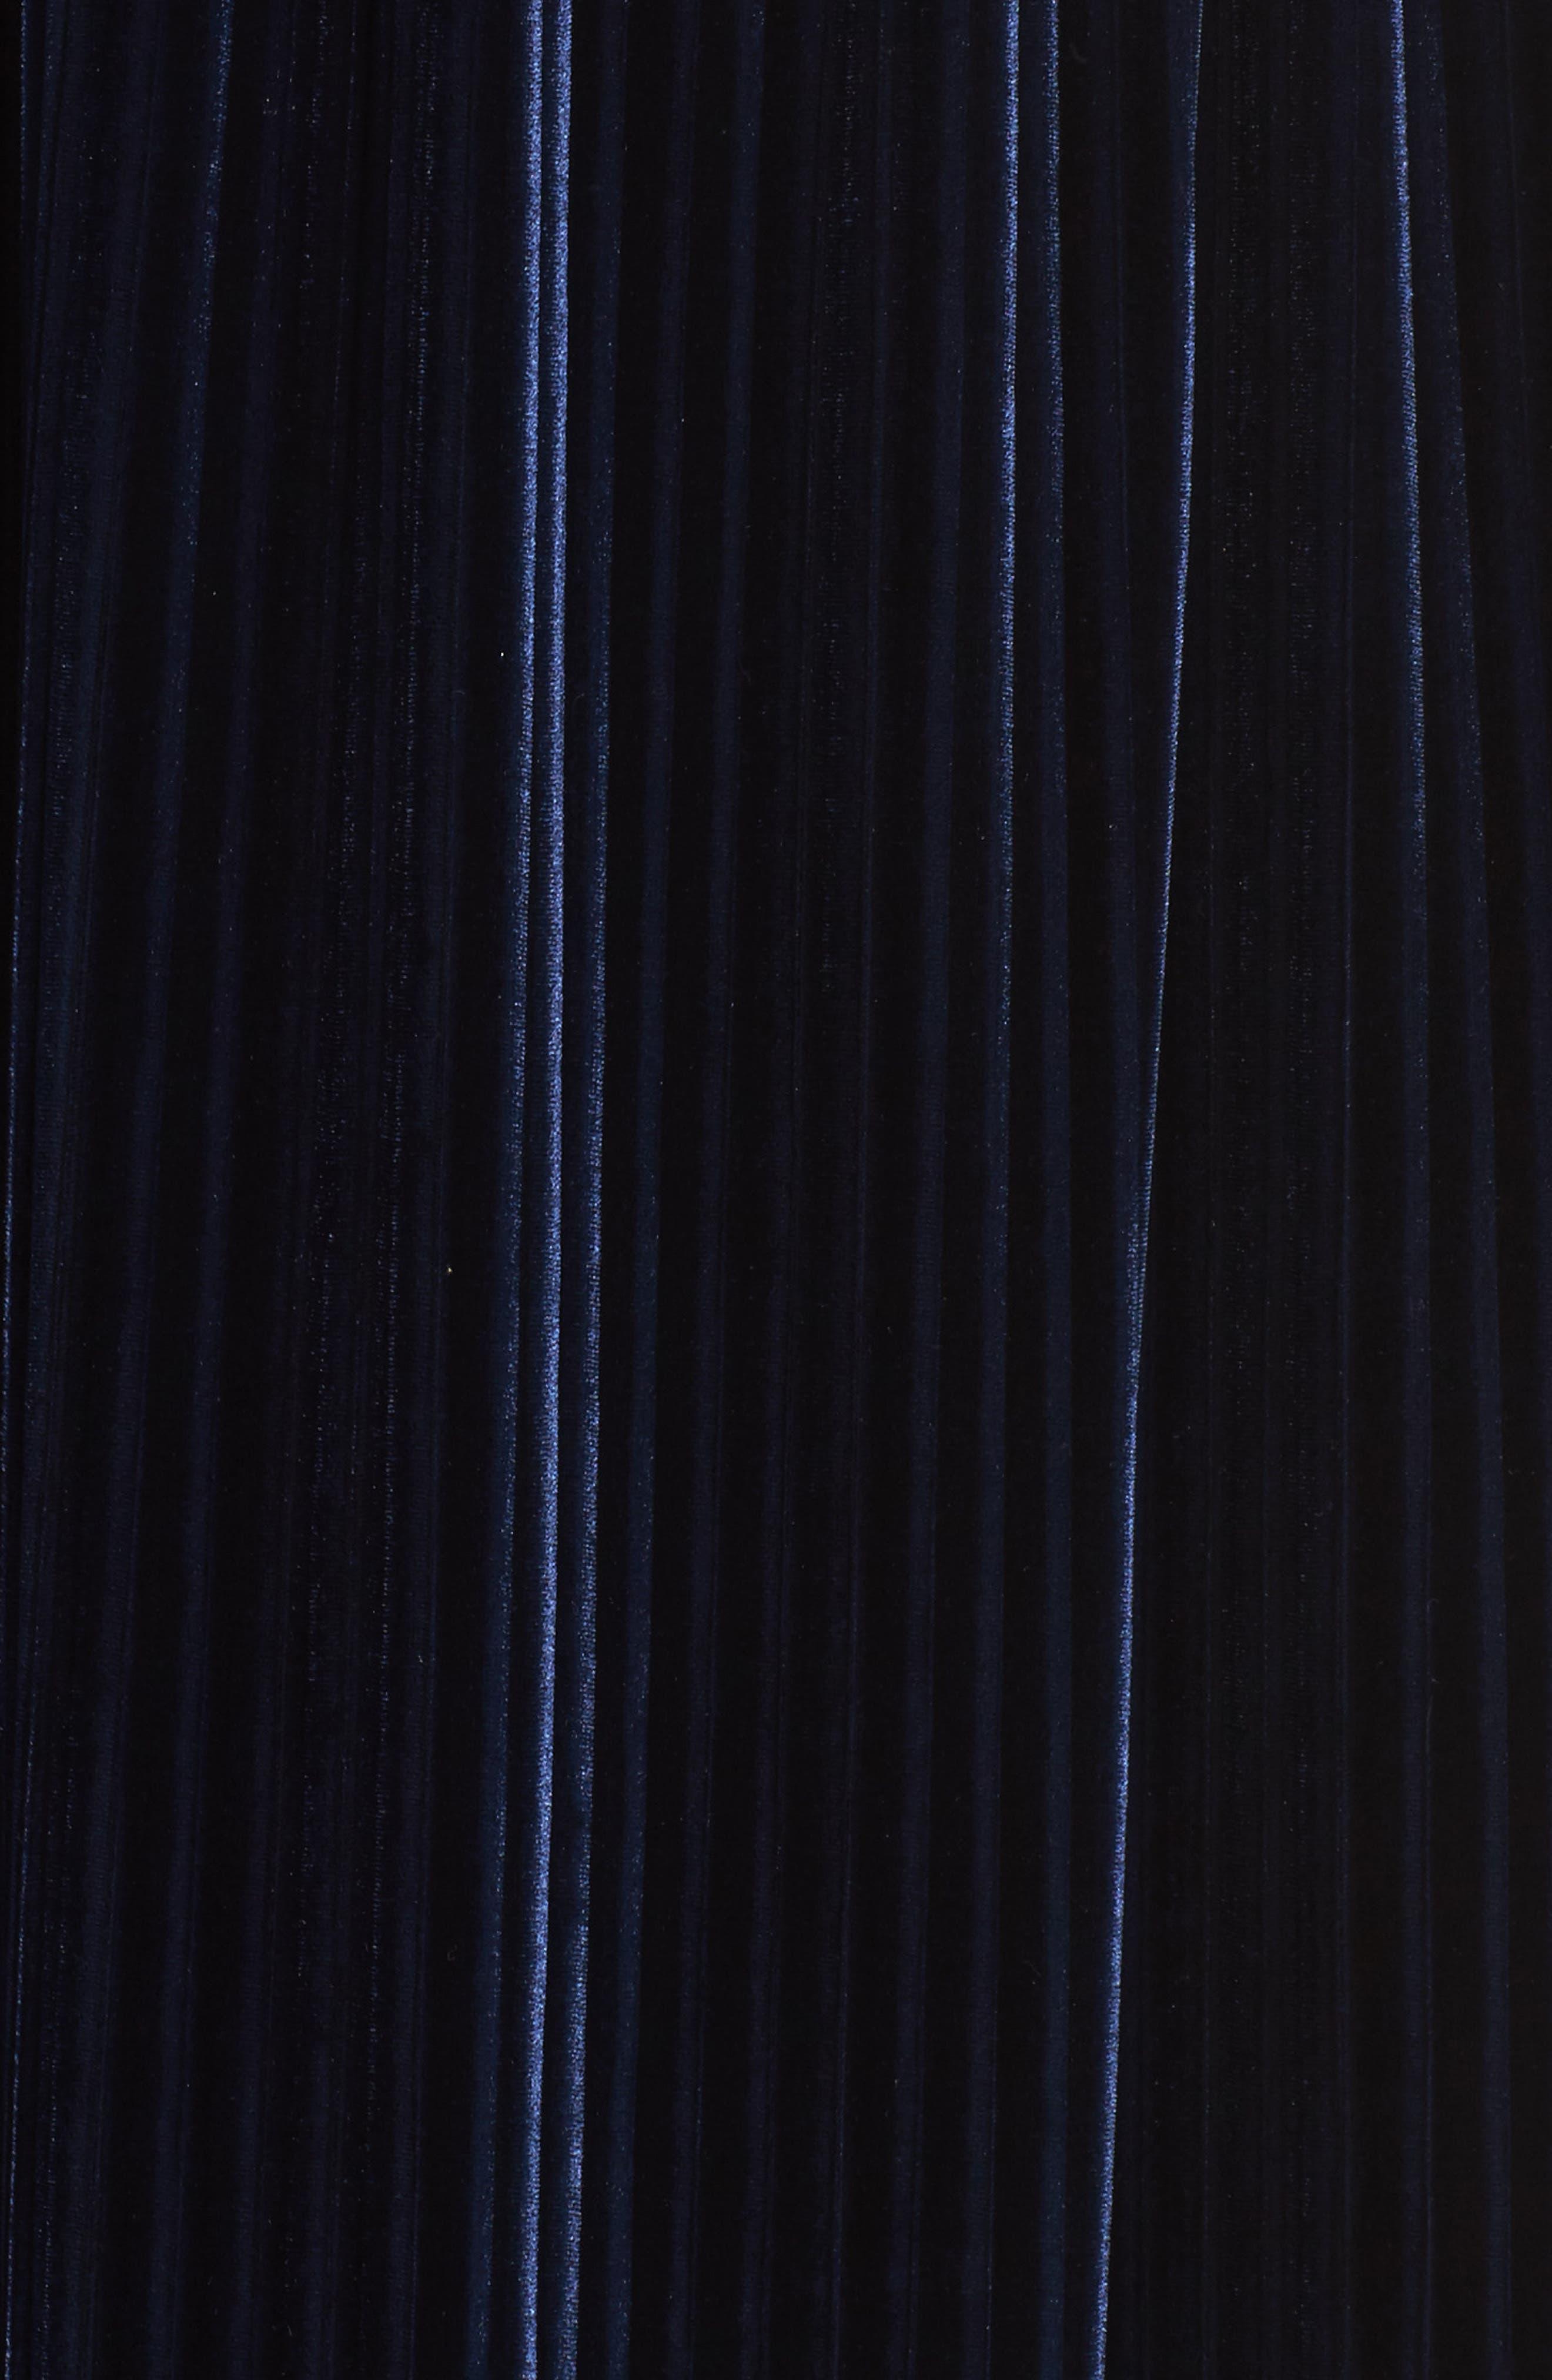 Crepe & Pleat Velvet Maxi Dress,                             Alternate thumbnail 5, color,